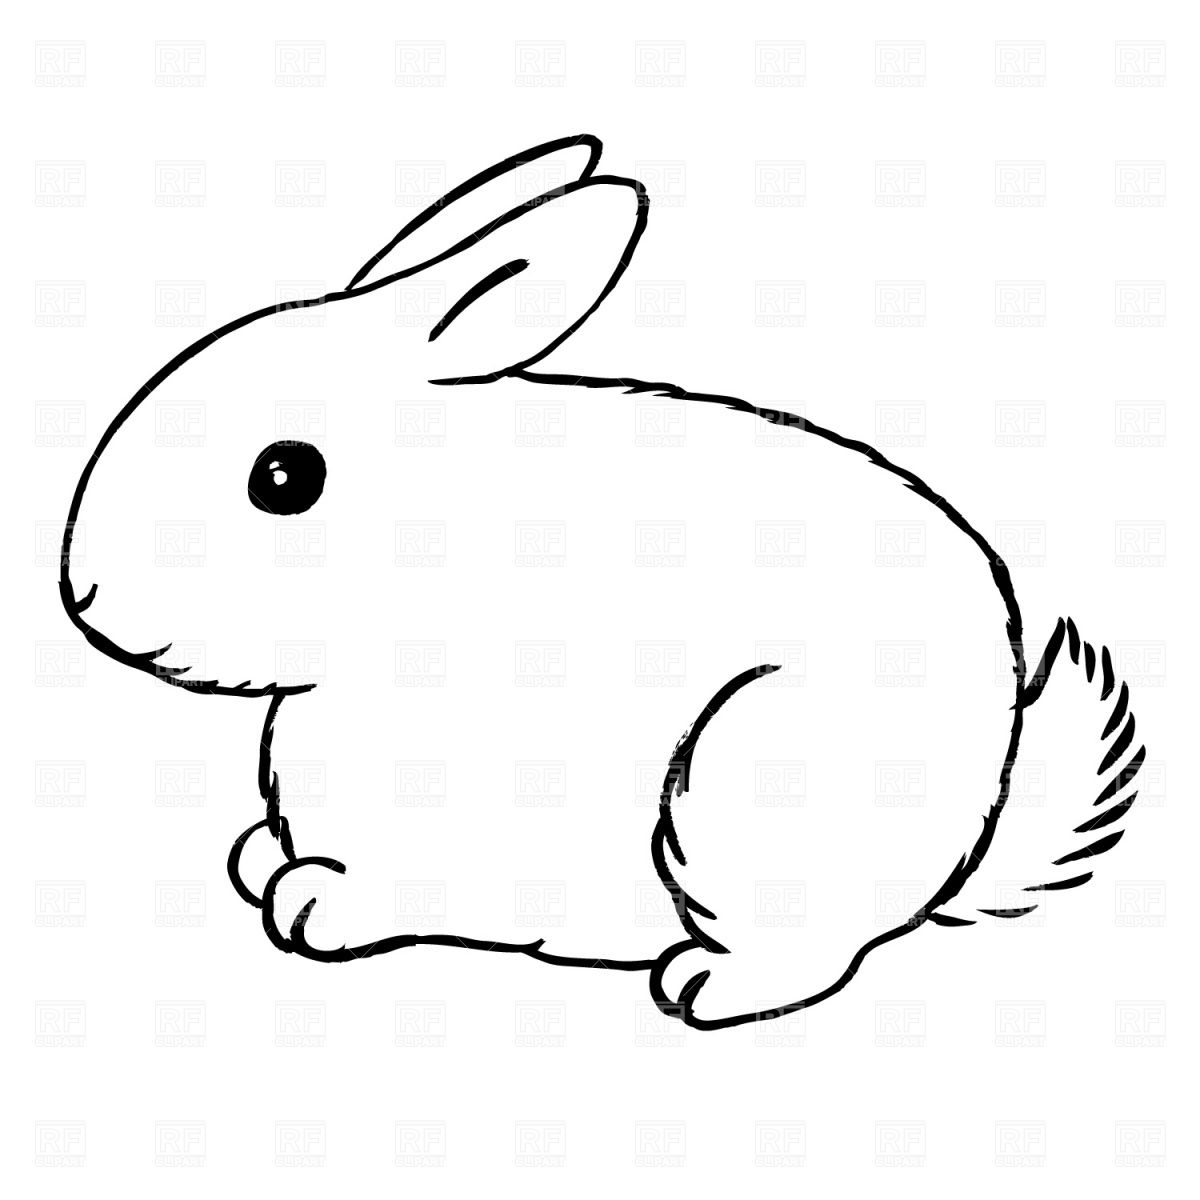 Drawings Of Rabbits And Bunnies